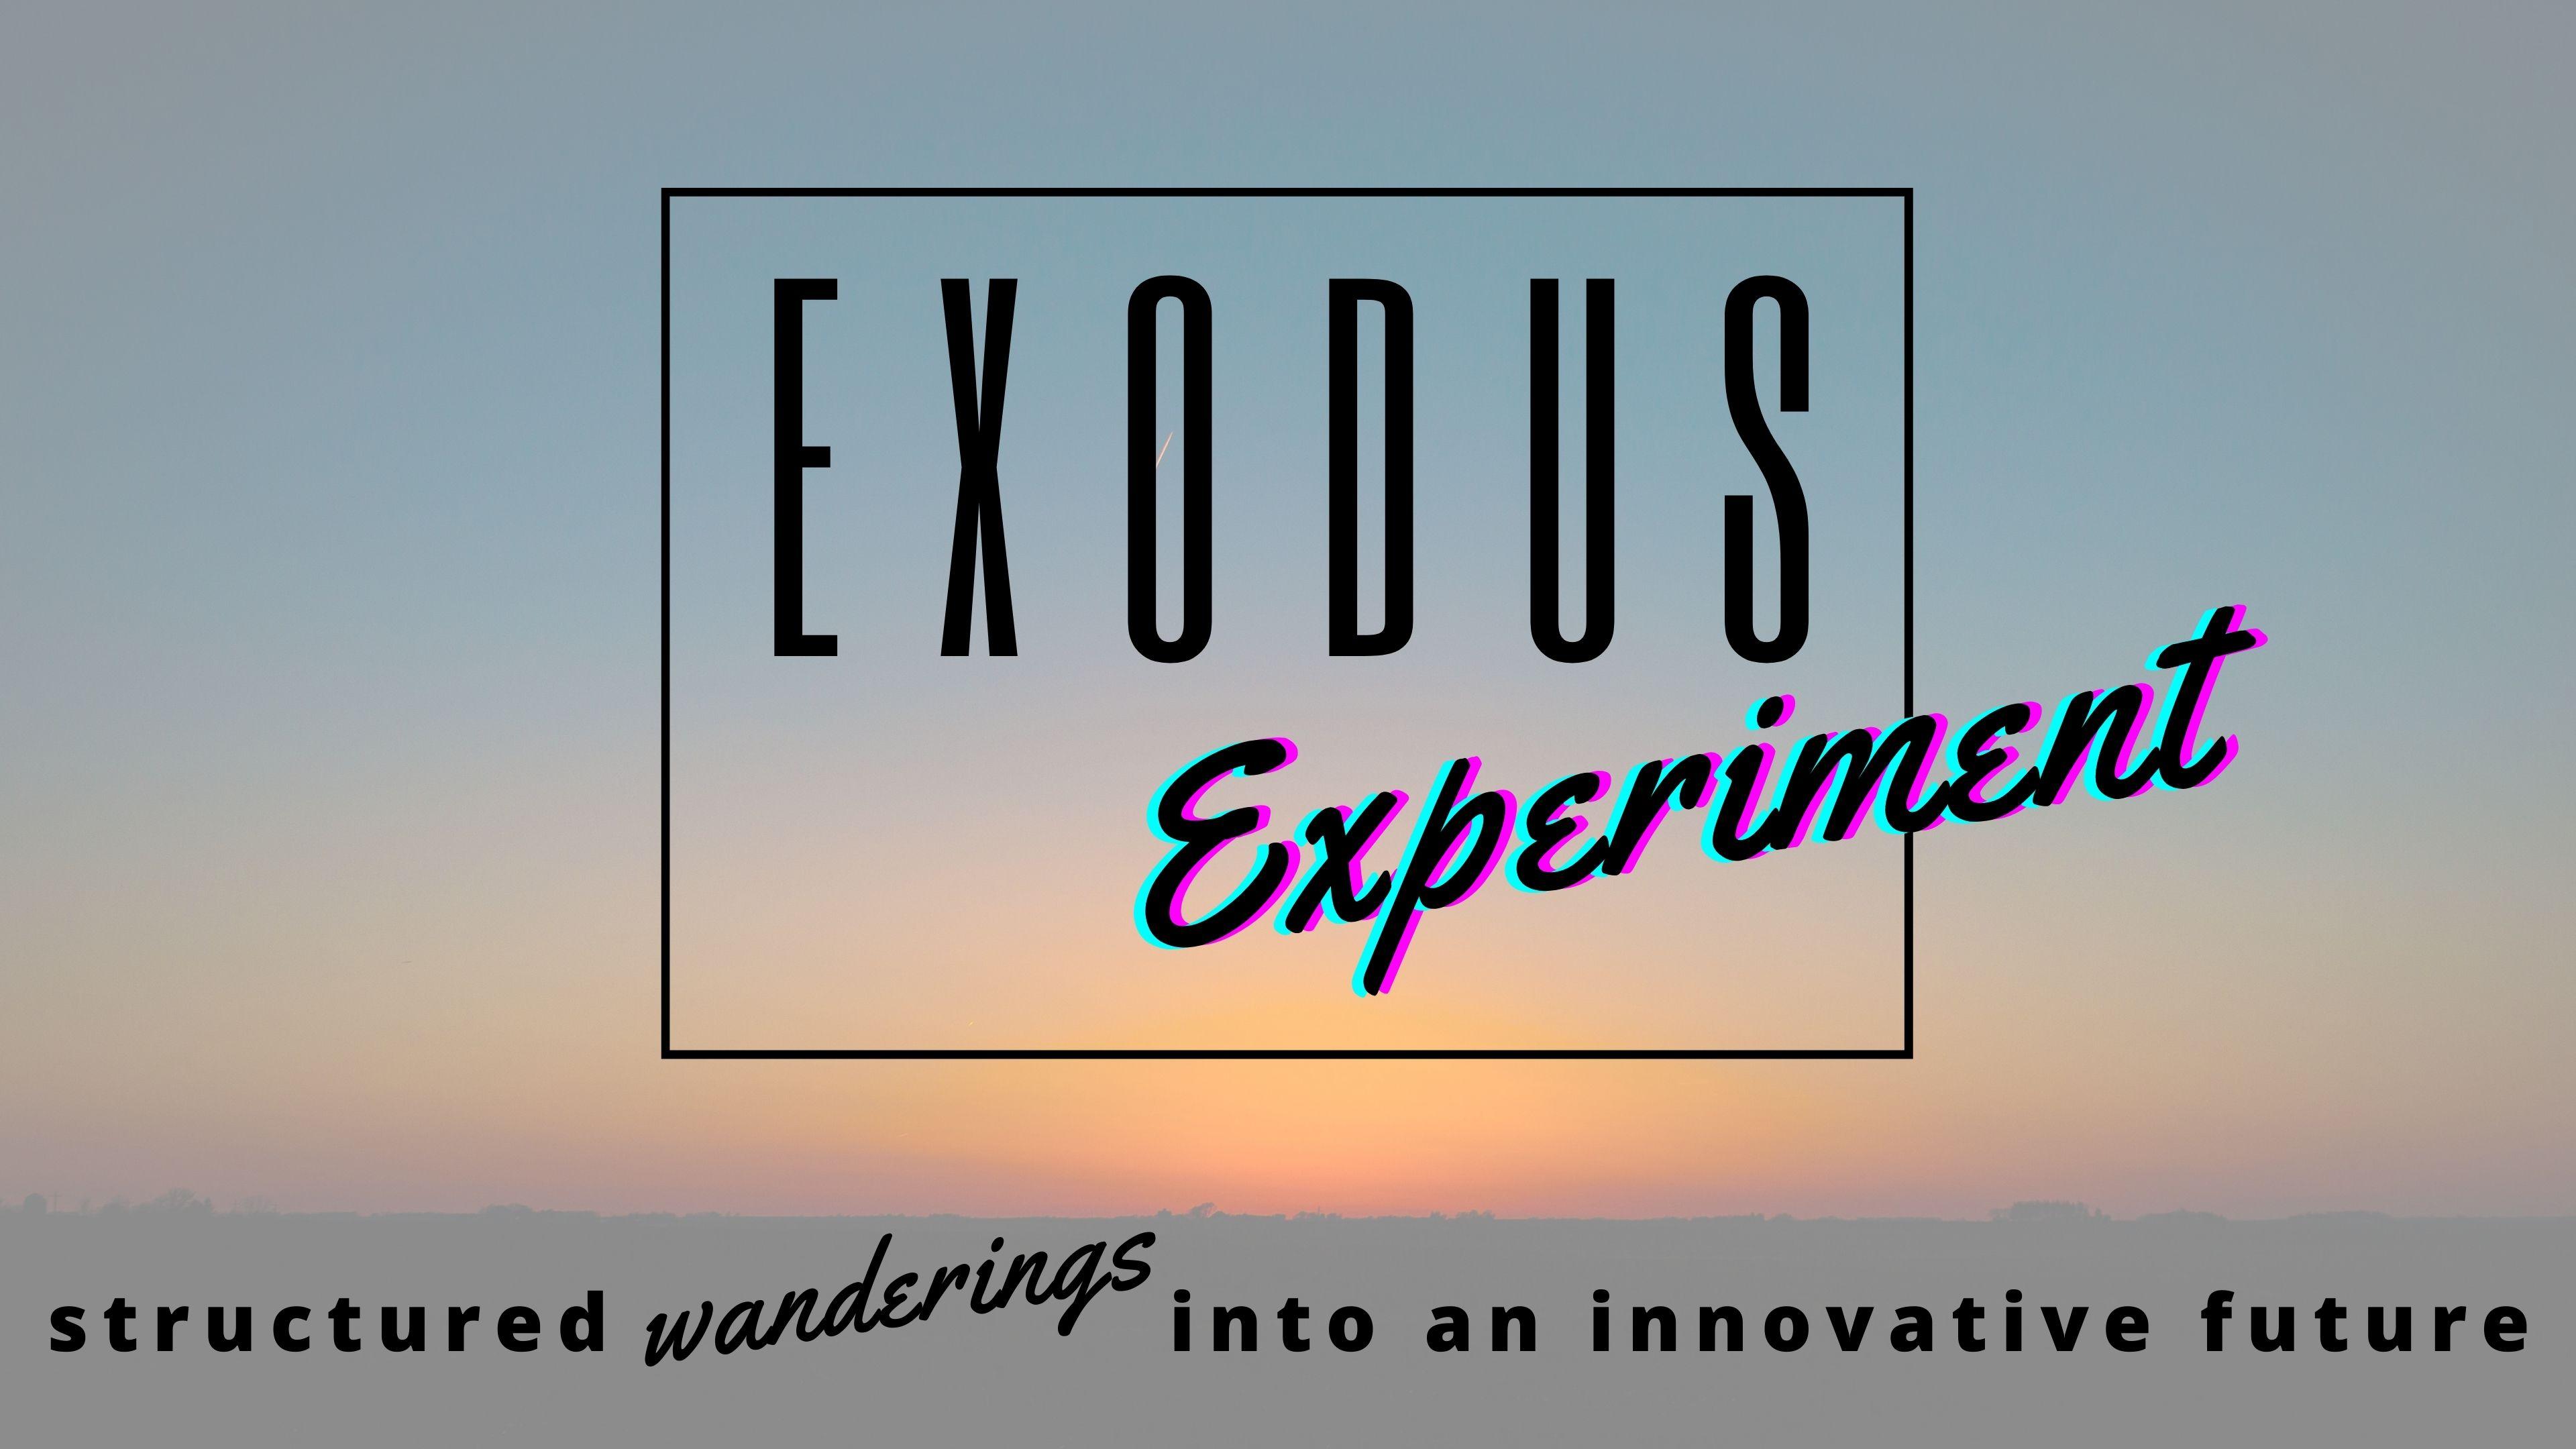 Exodus Experiment